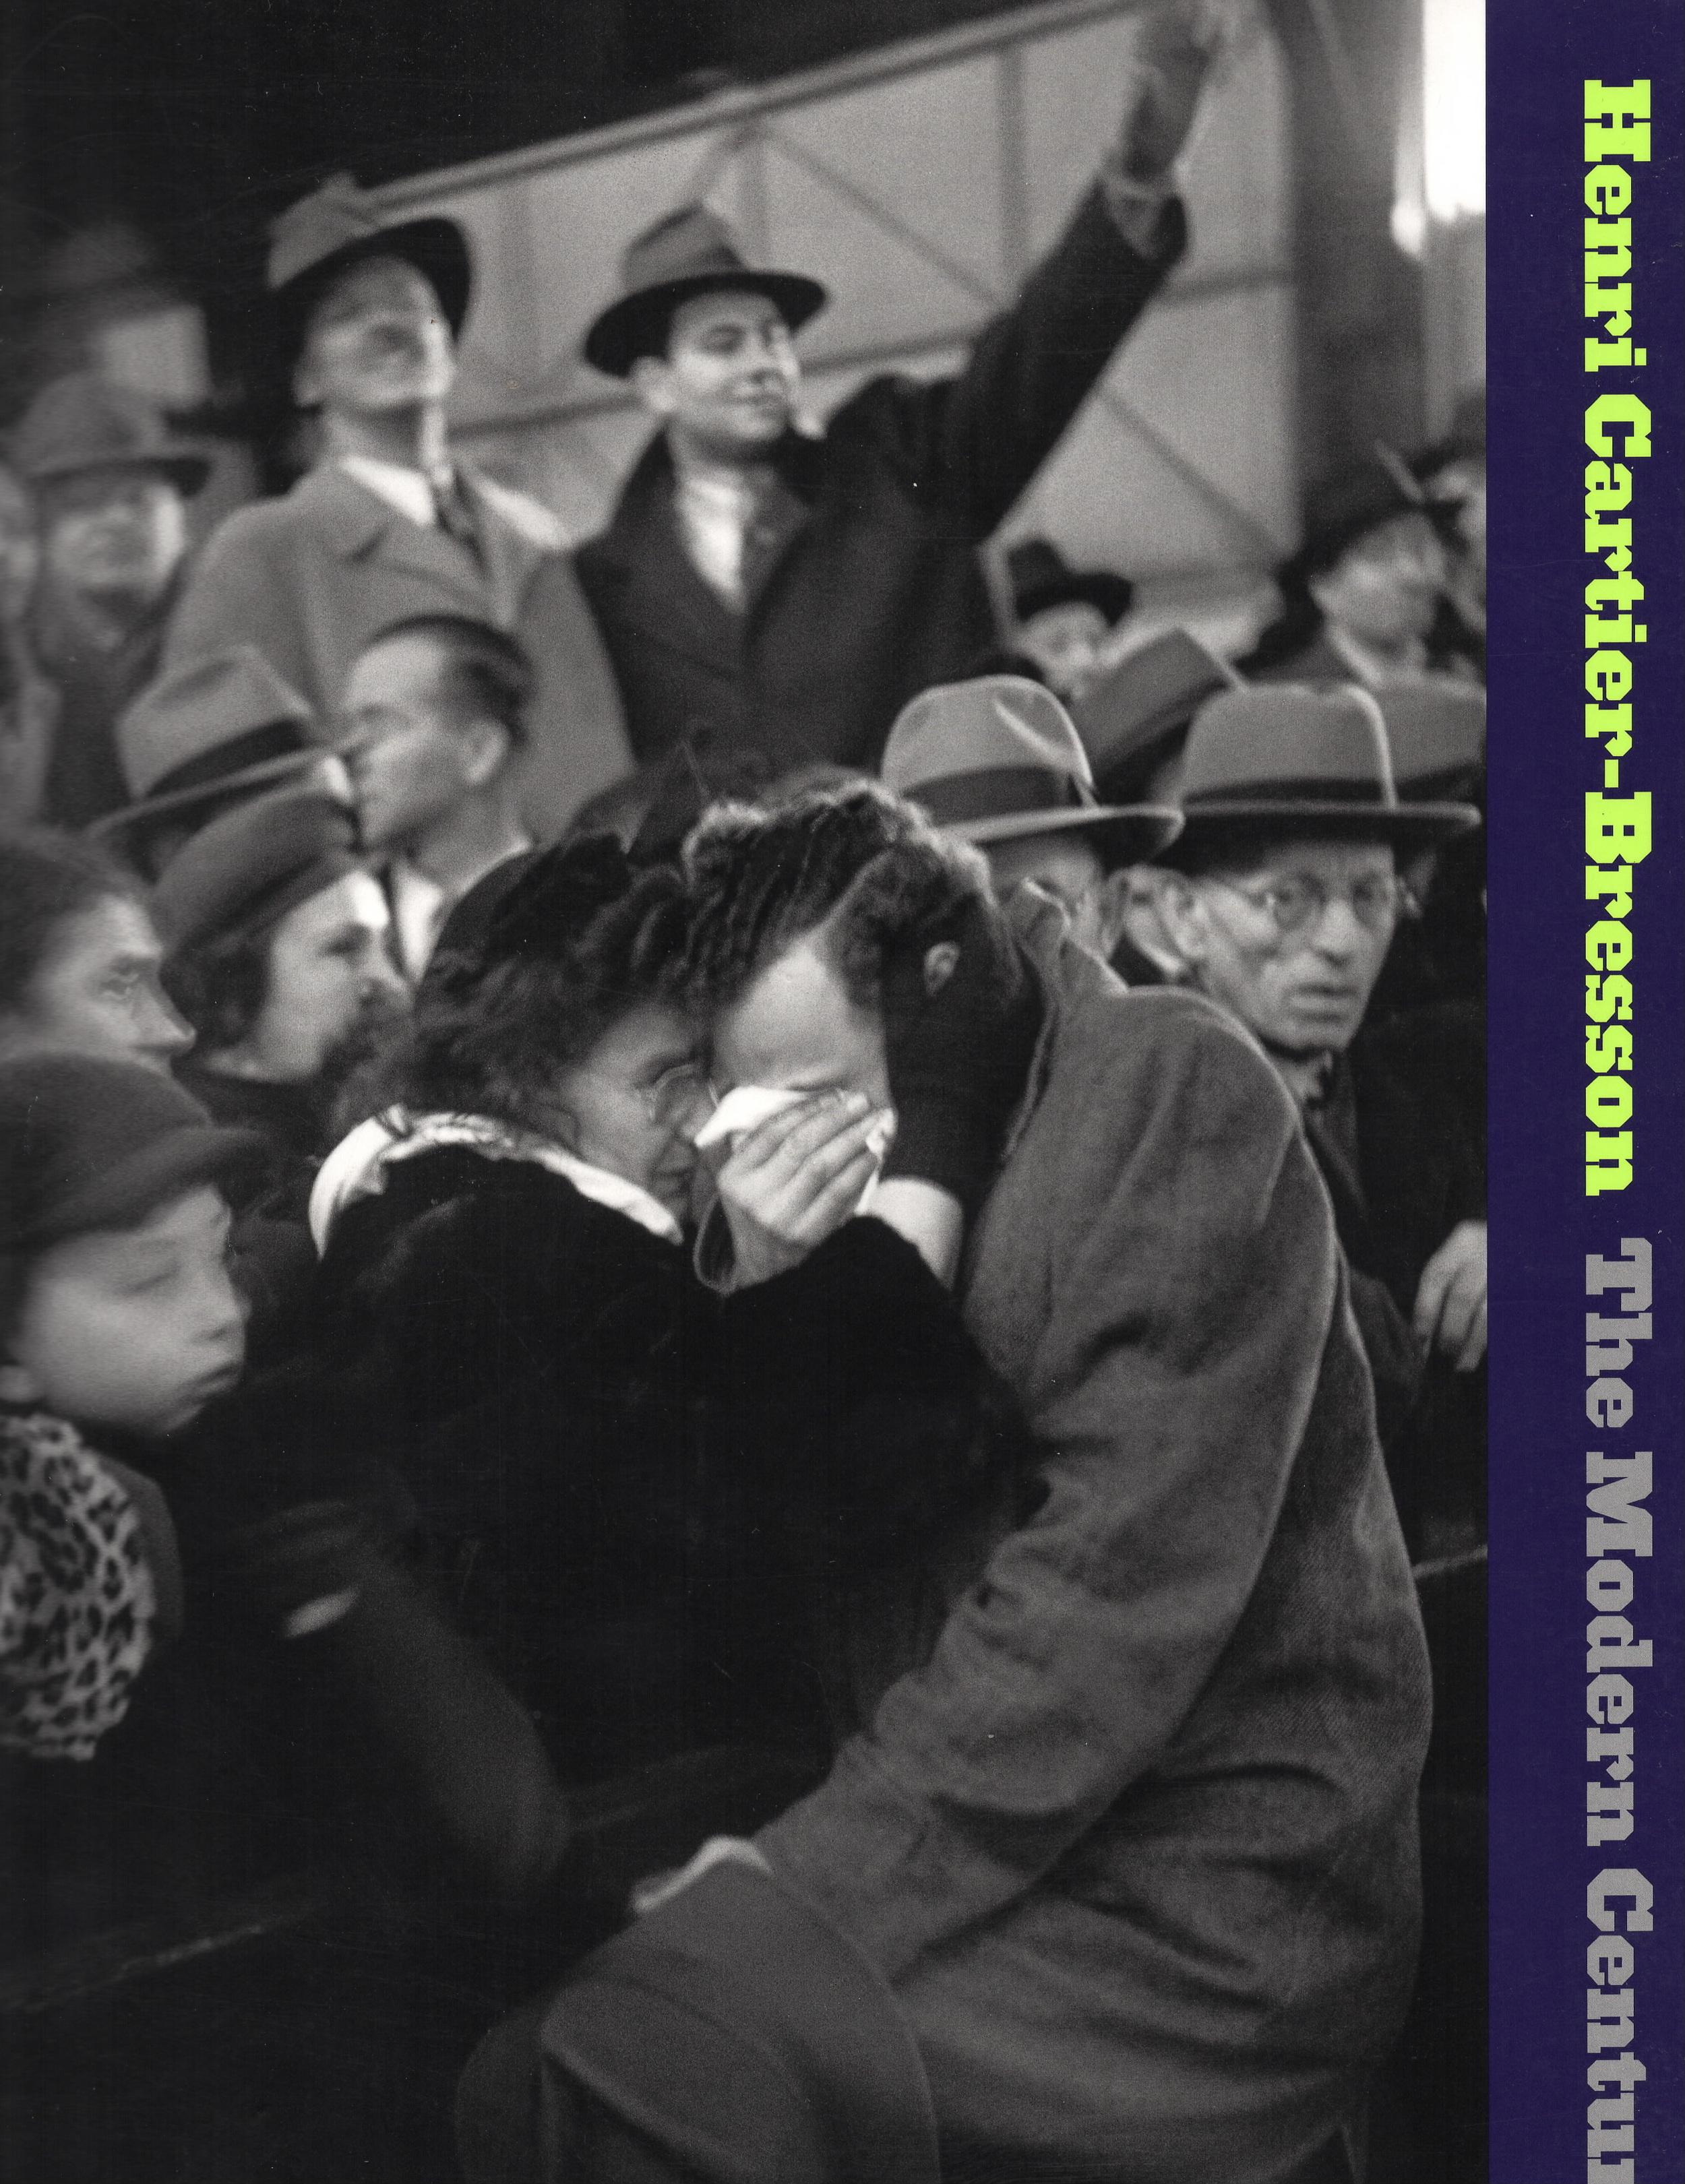 Cover of the Museum of Modern Art's 2010 Retrospective of Henri Cartier-Bresson The Modern Century, copyright 2010, Museum of Modern Art (under Fair Use)